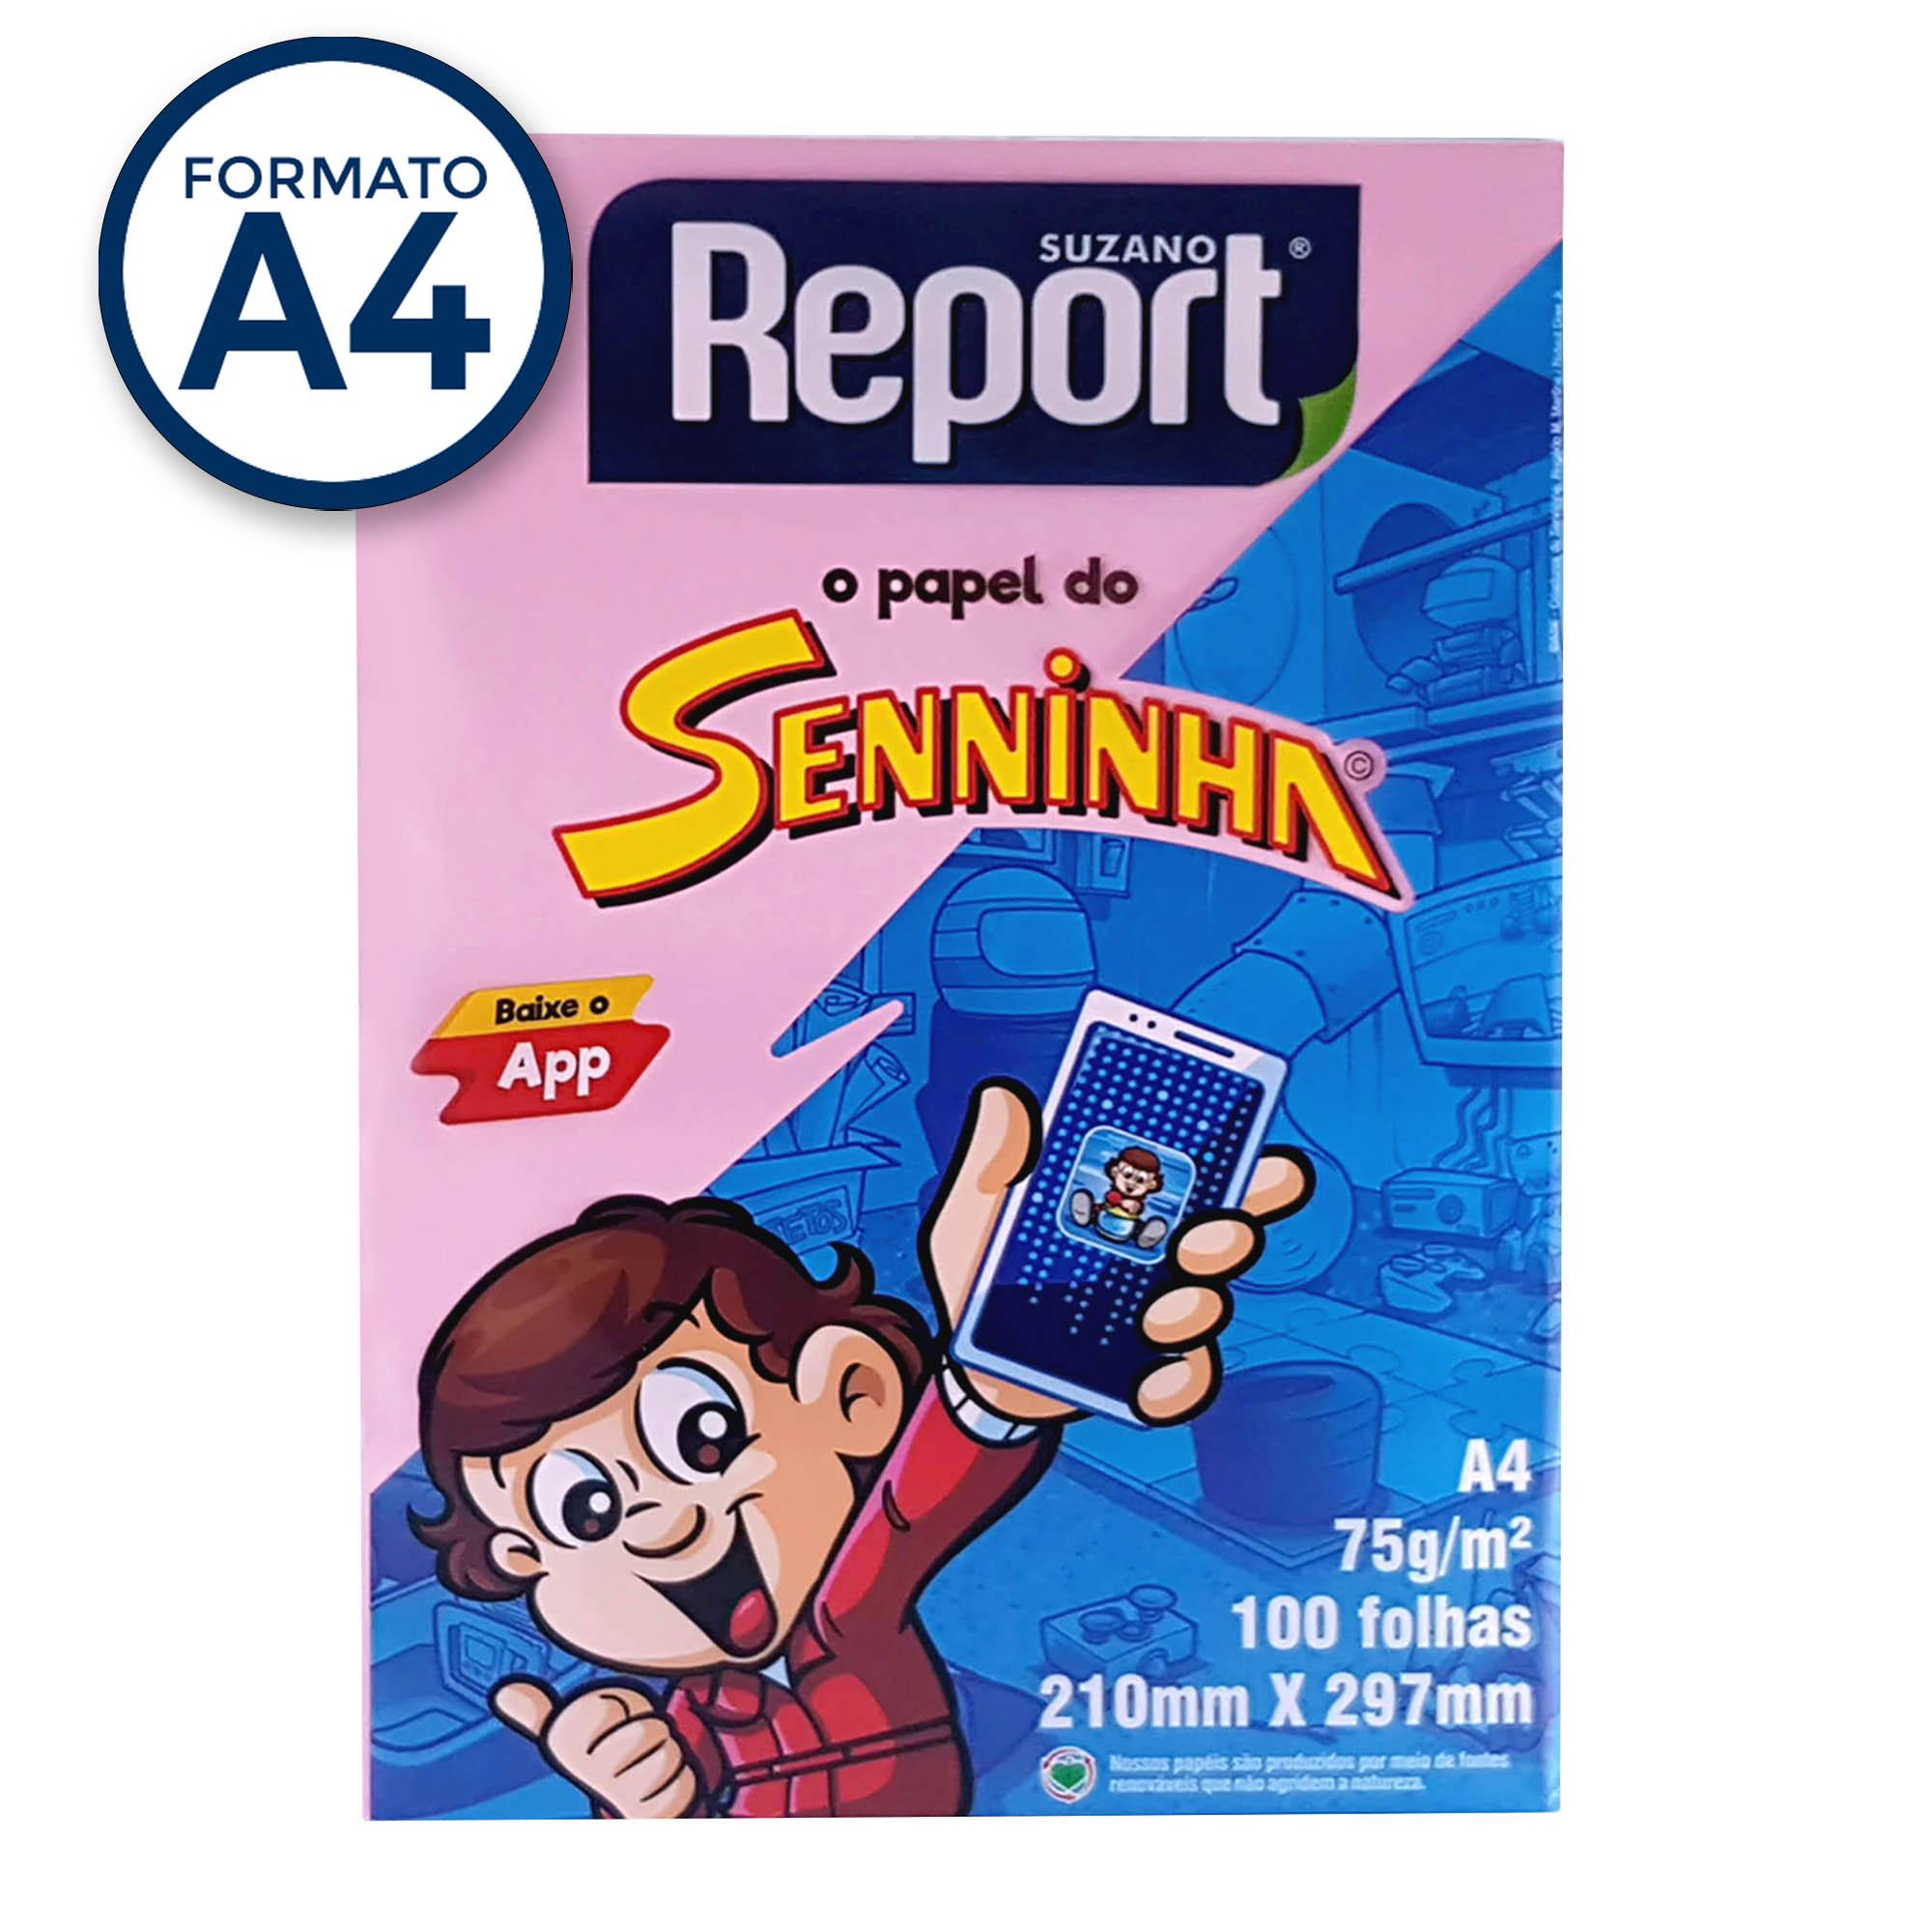 Papel Sulfite A4 Rosa 75g Report Senninha  PT 100 fls - Suzano